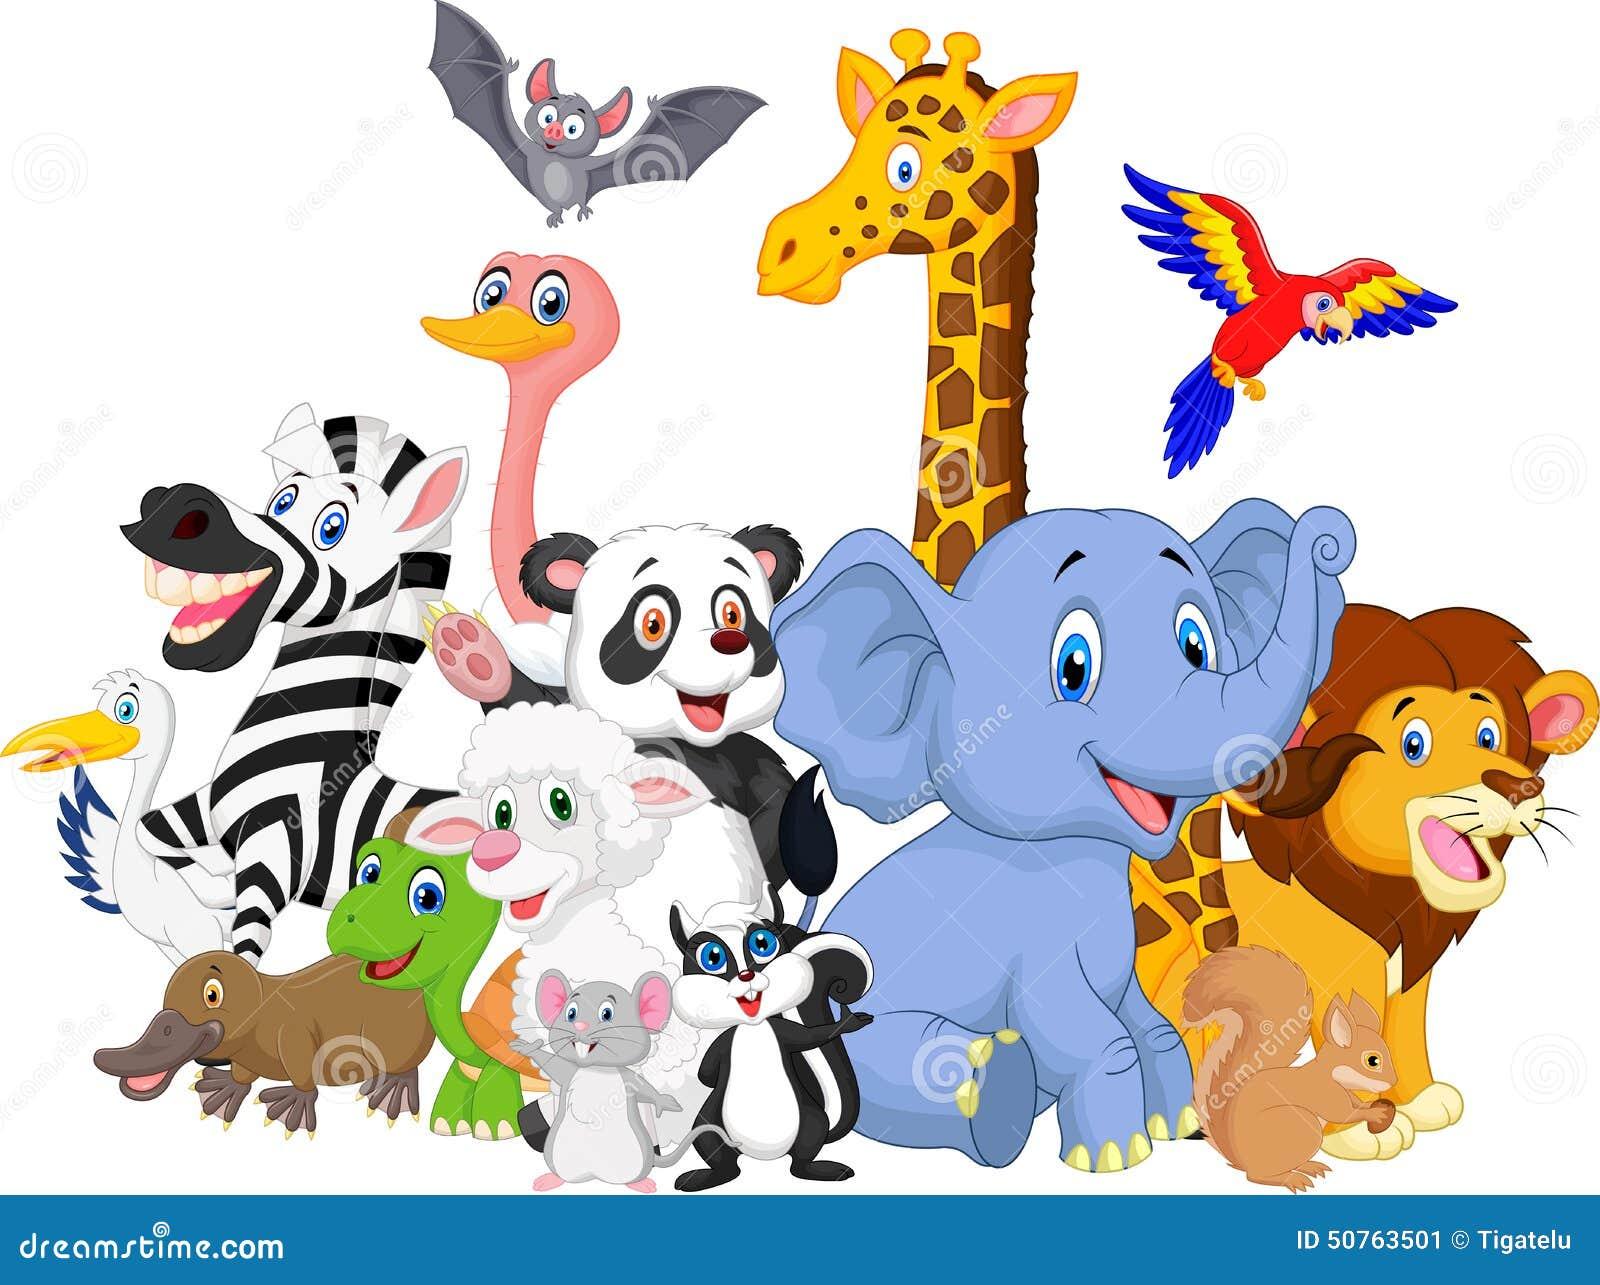 Cartoon Wild Animals Background Stock Vector - Image: 50763501